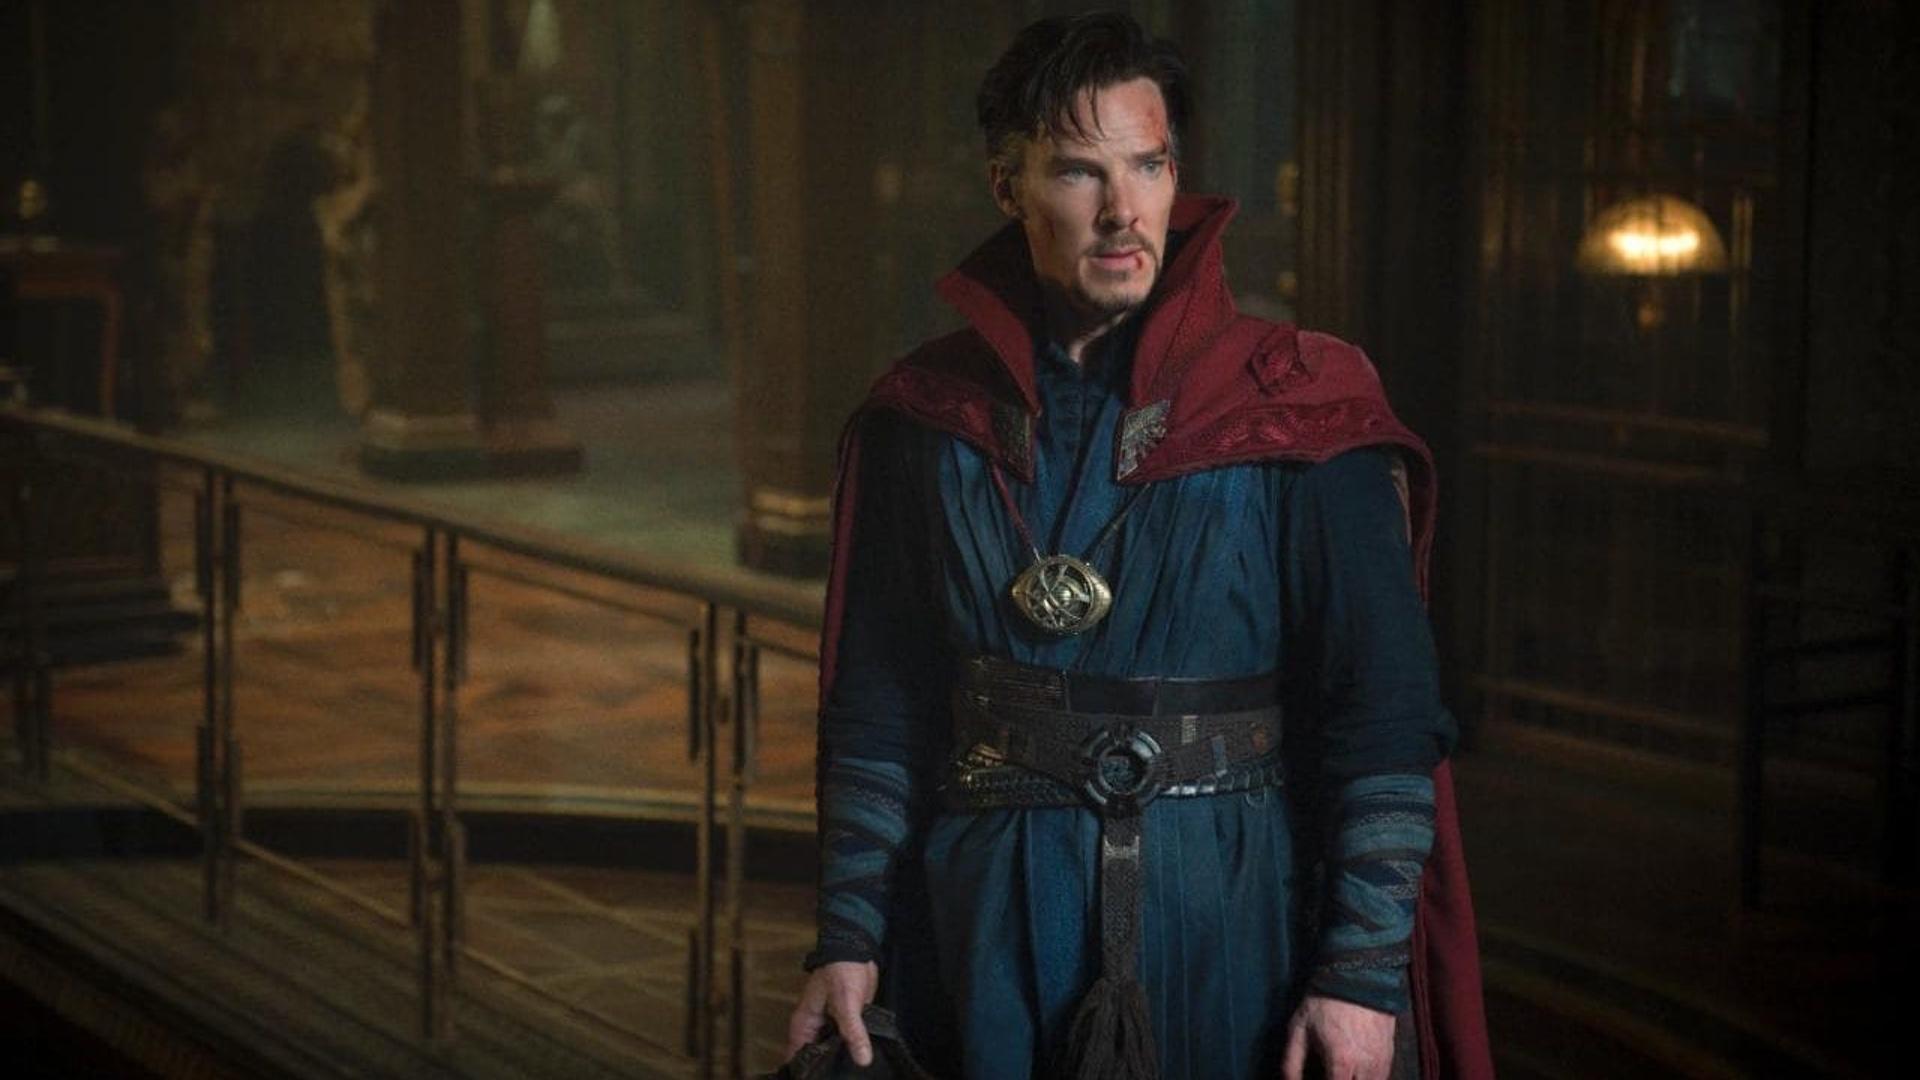 Avengers: Infinity War' Disintegration Meme Makes Fun of the Darkest